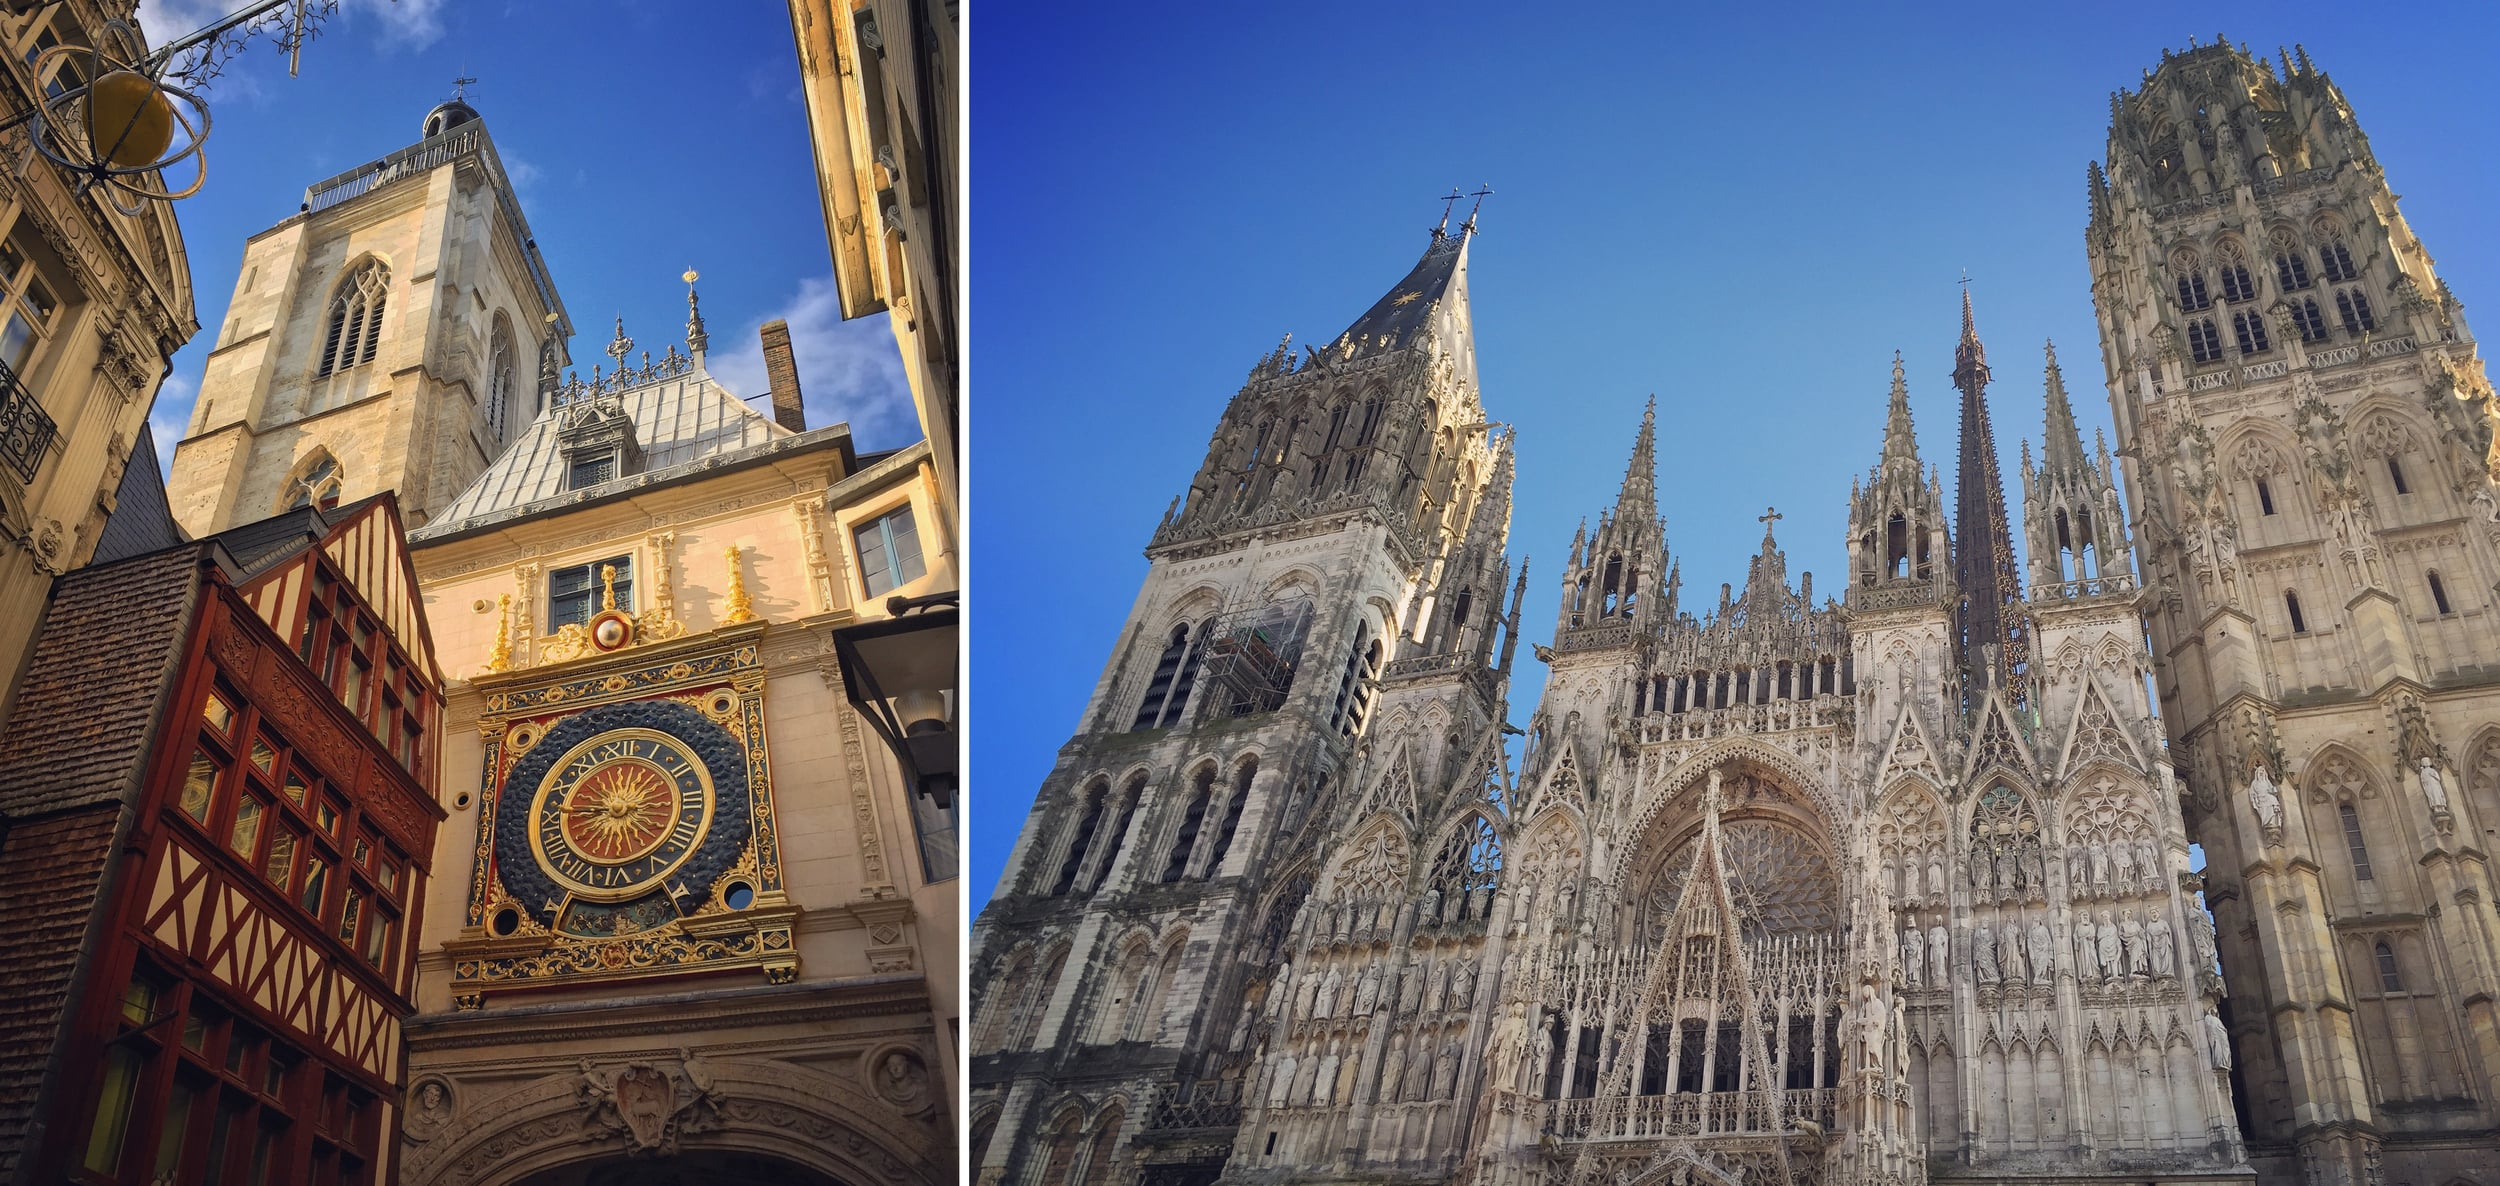 The Gros Horloge, a Renaissance-era astronomical clock, and Cathedral Notre Dame du Rouen in Rouen, France